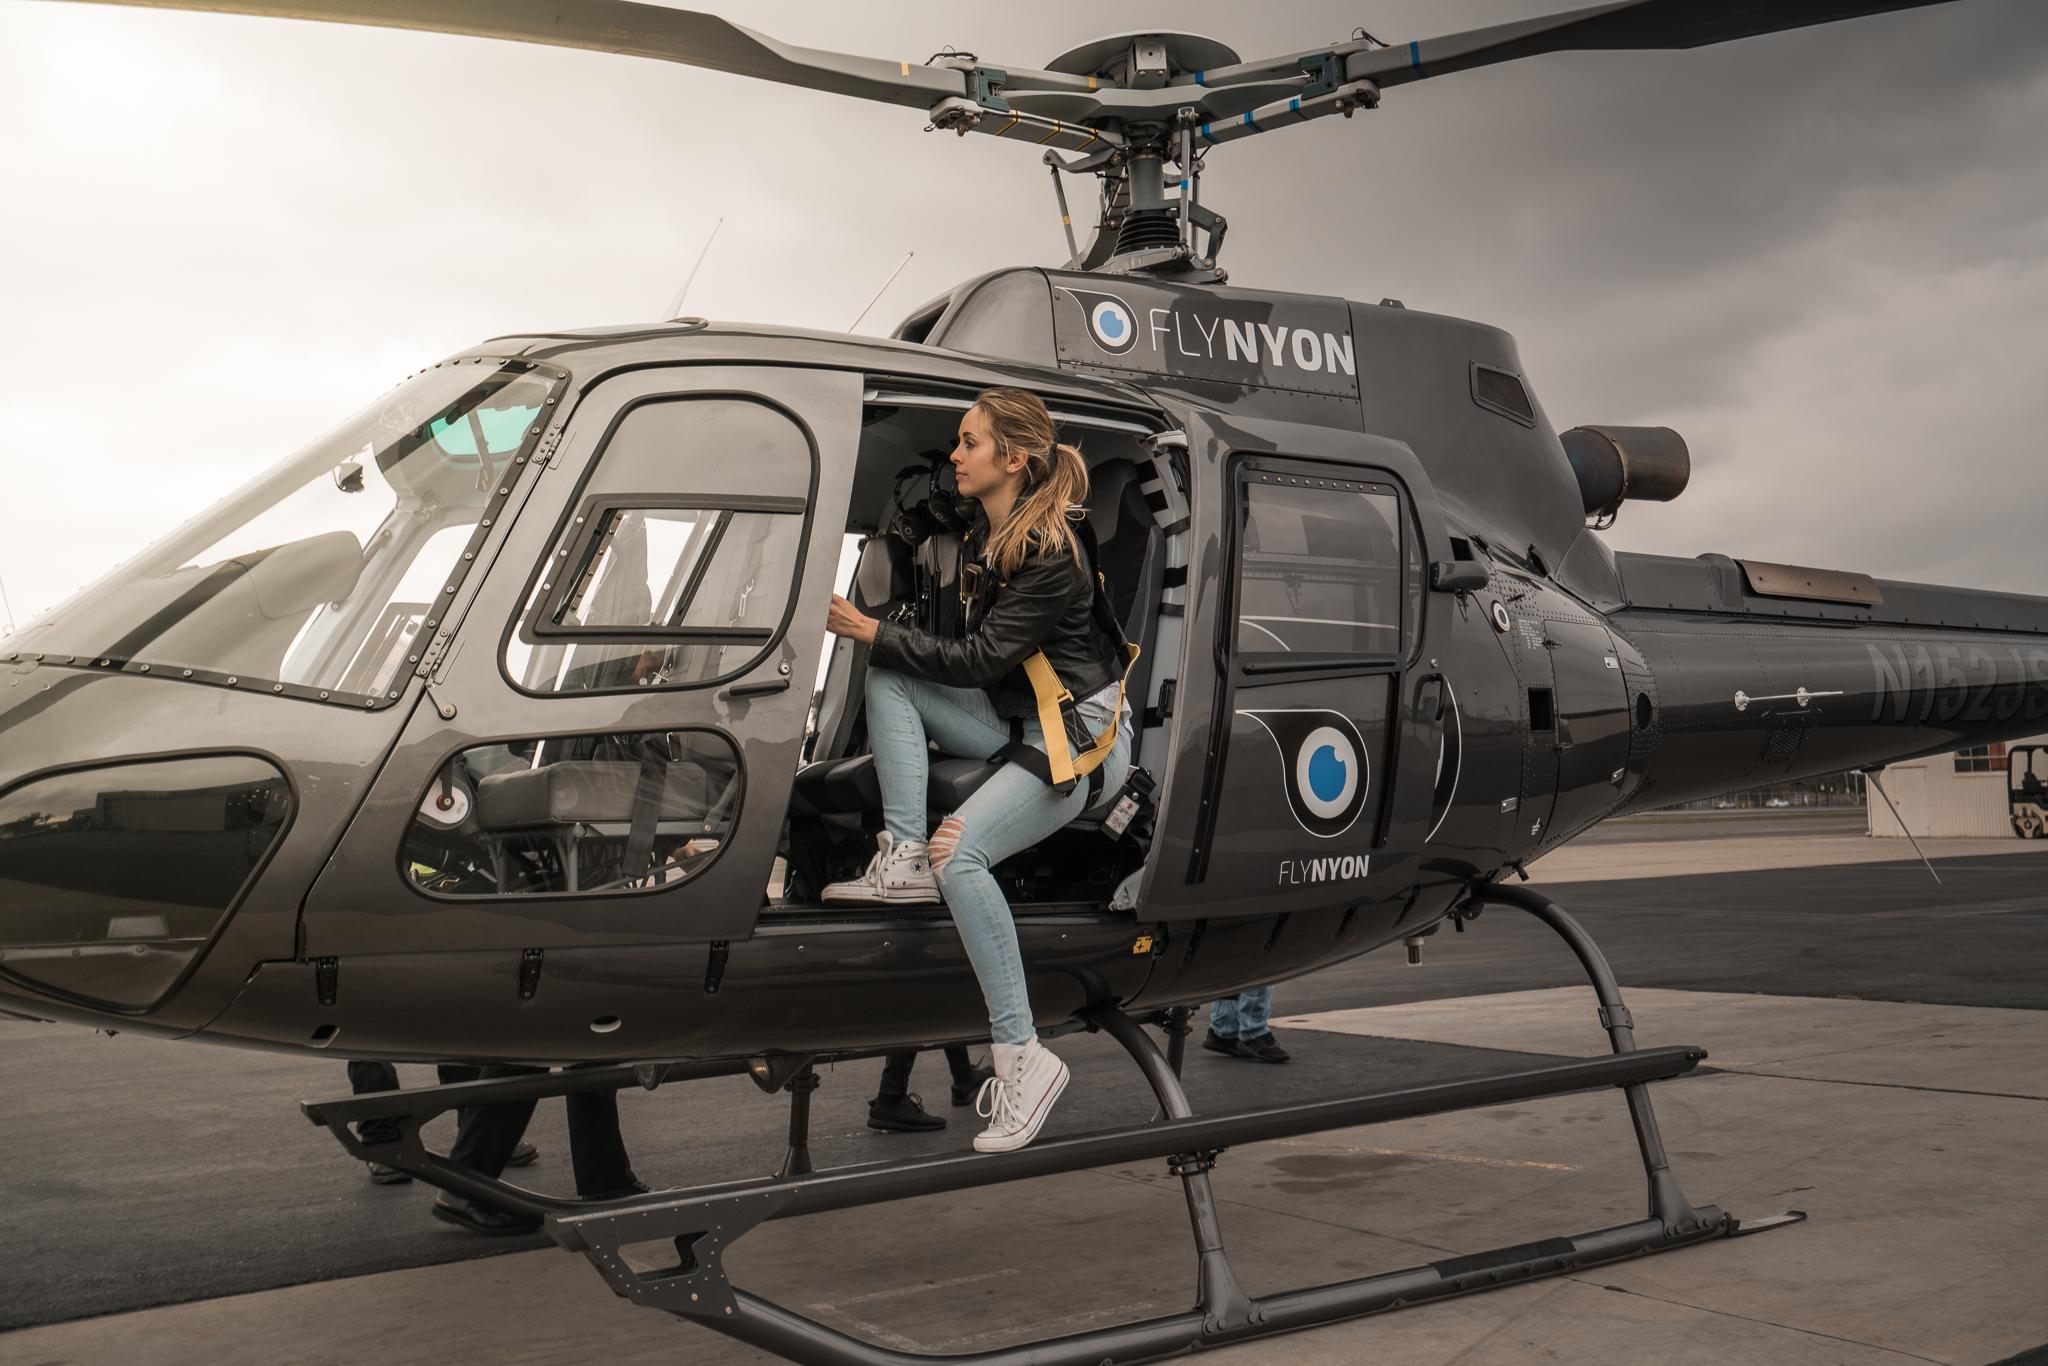 FlyNYON Los Angeles Open Door Helicopter Ride